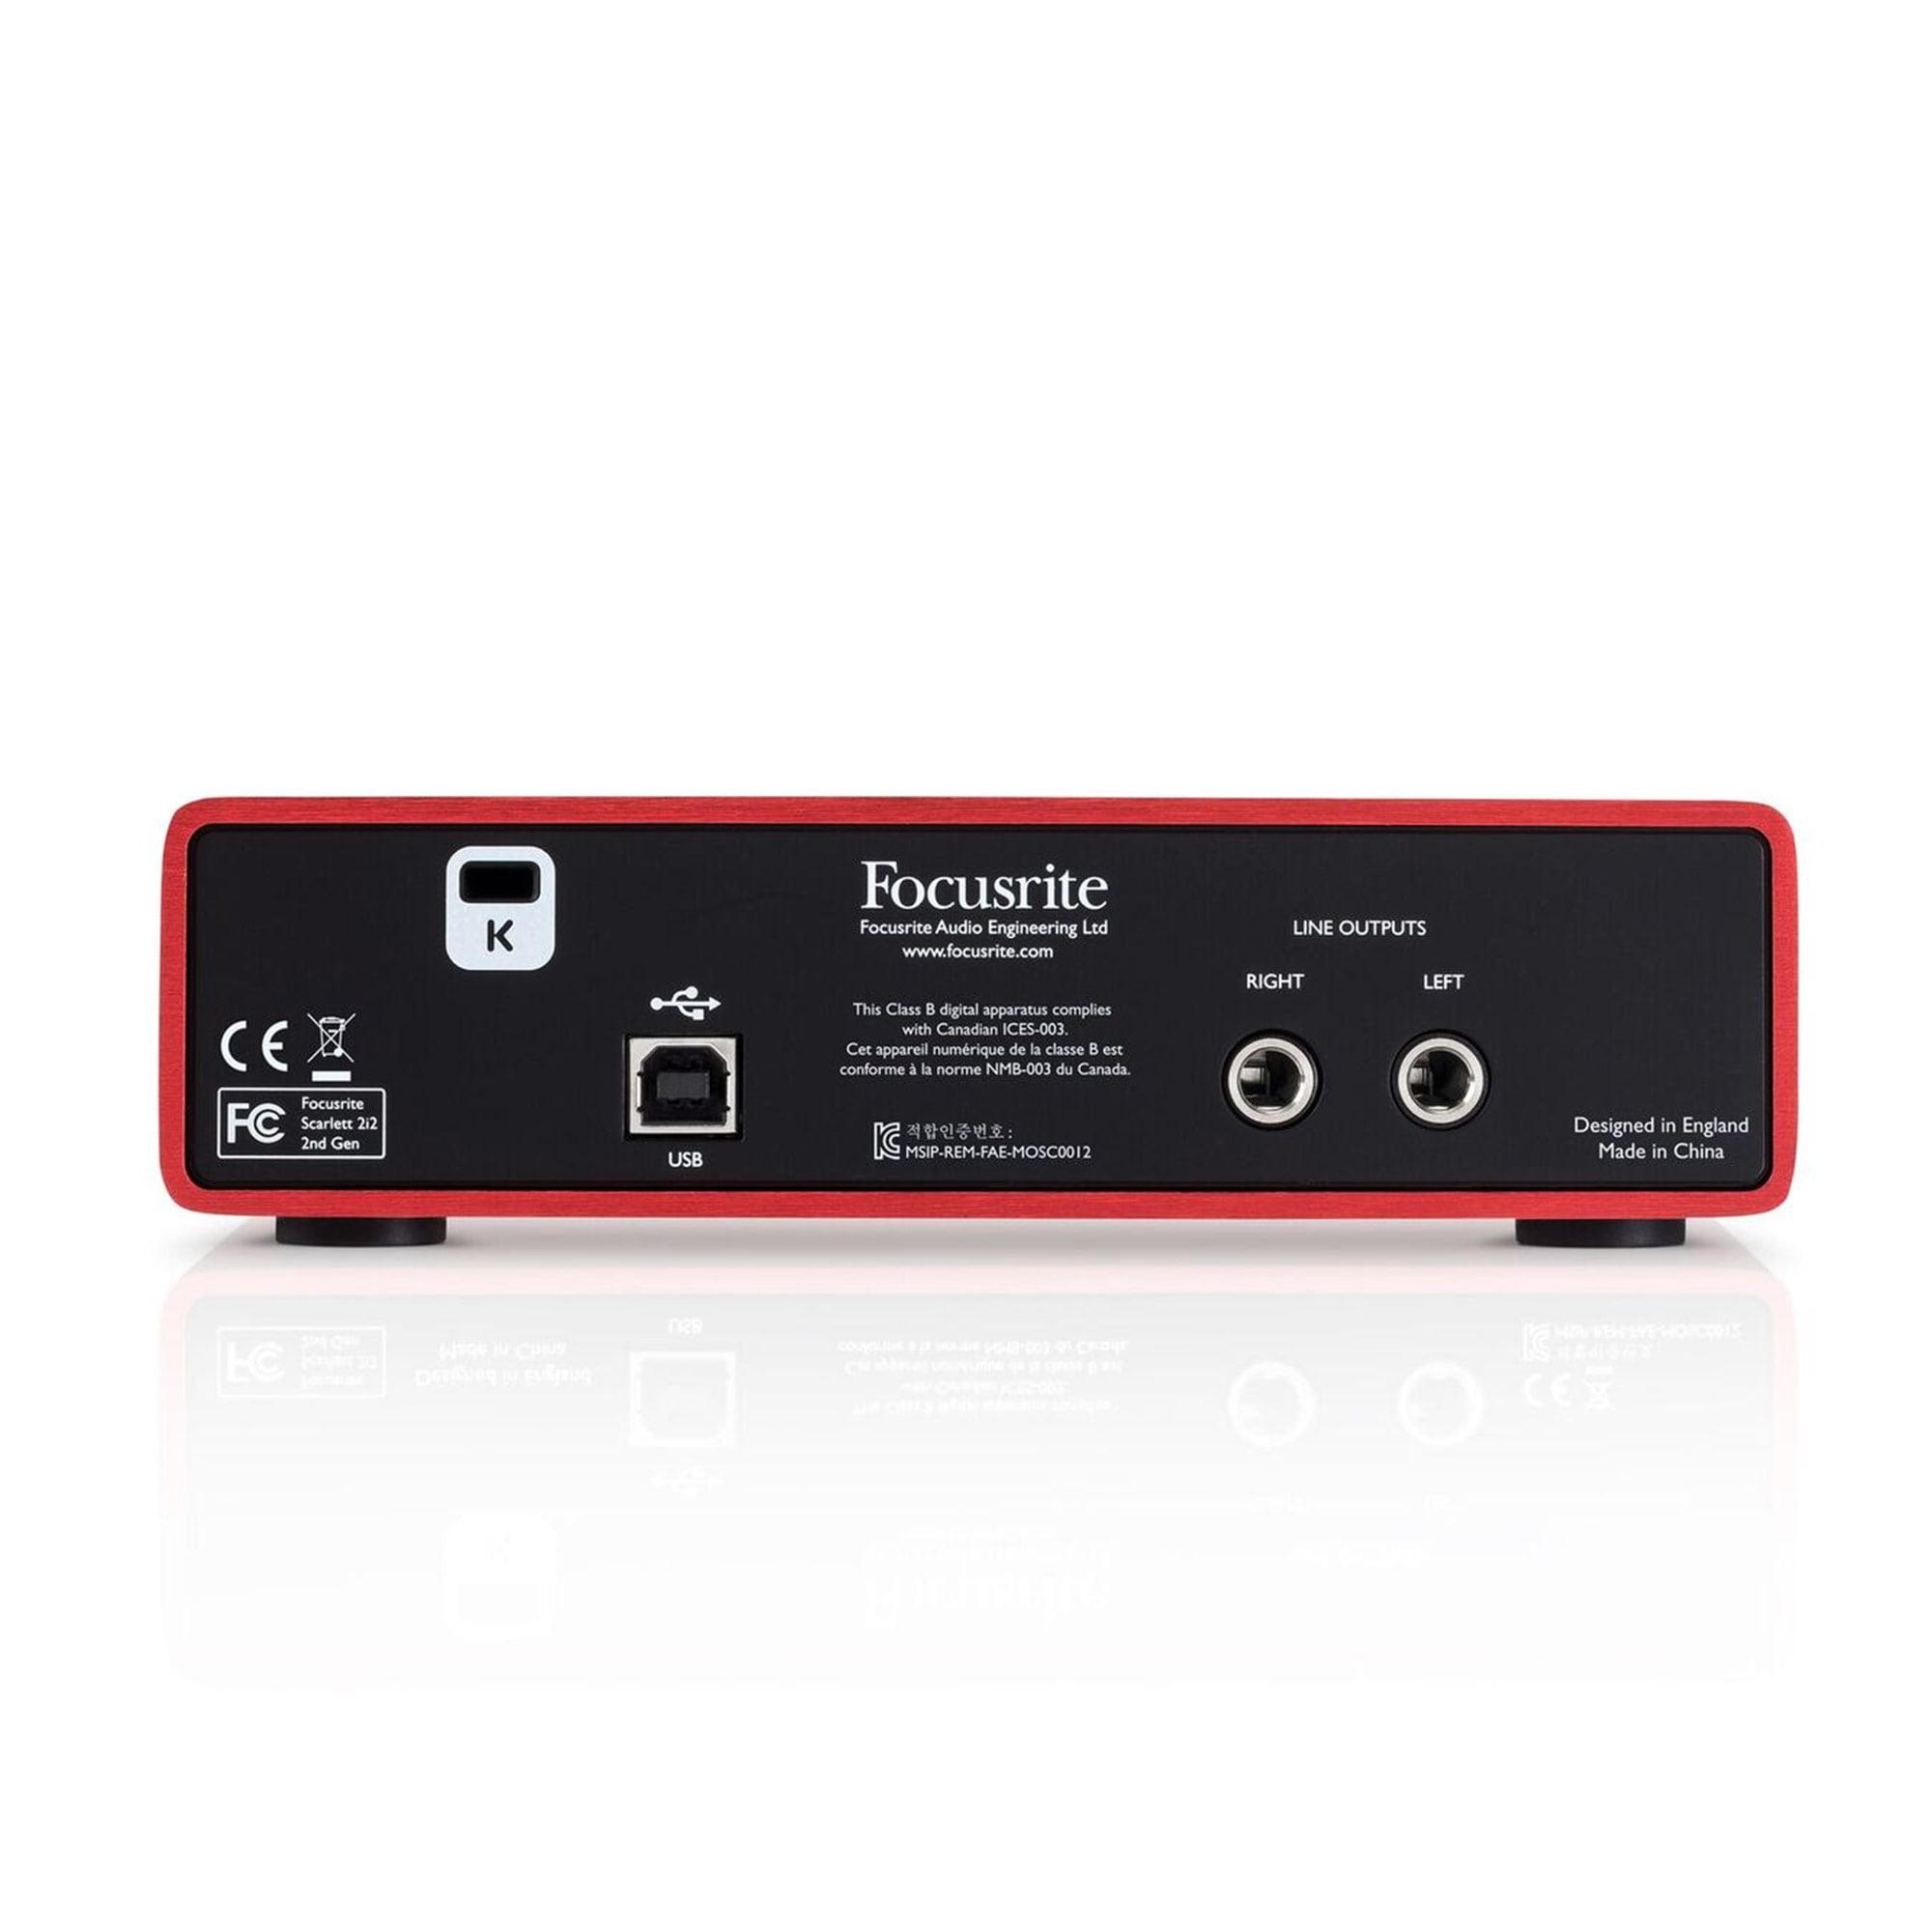 Focusrite Scarlett 2i2 USB 2.0 Audio Driver for Windows 10